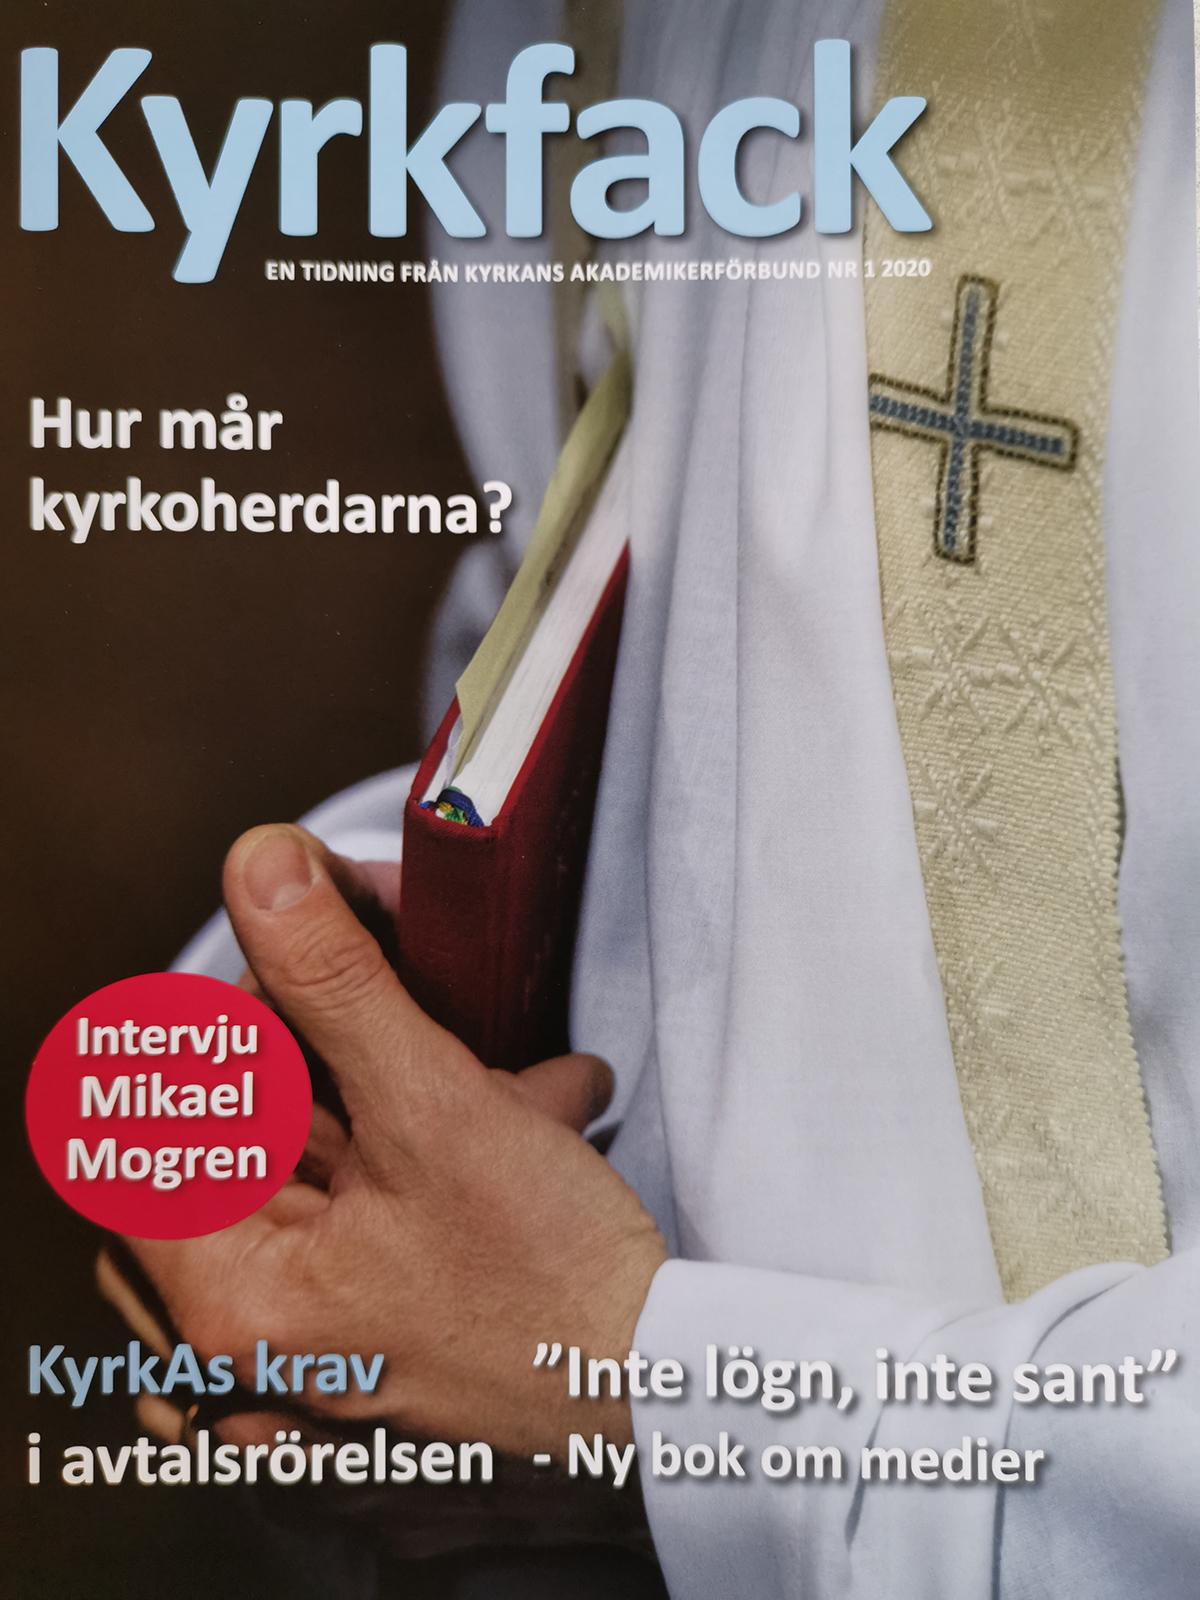 Kyrkfack nr 1 2020 KyrkA